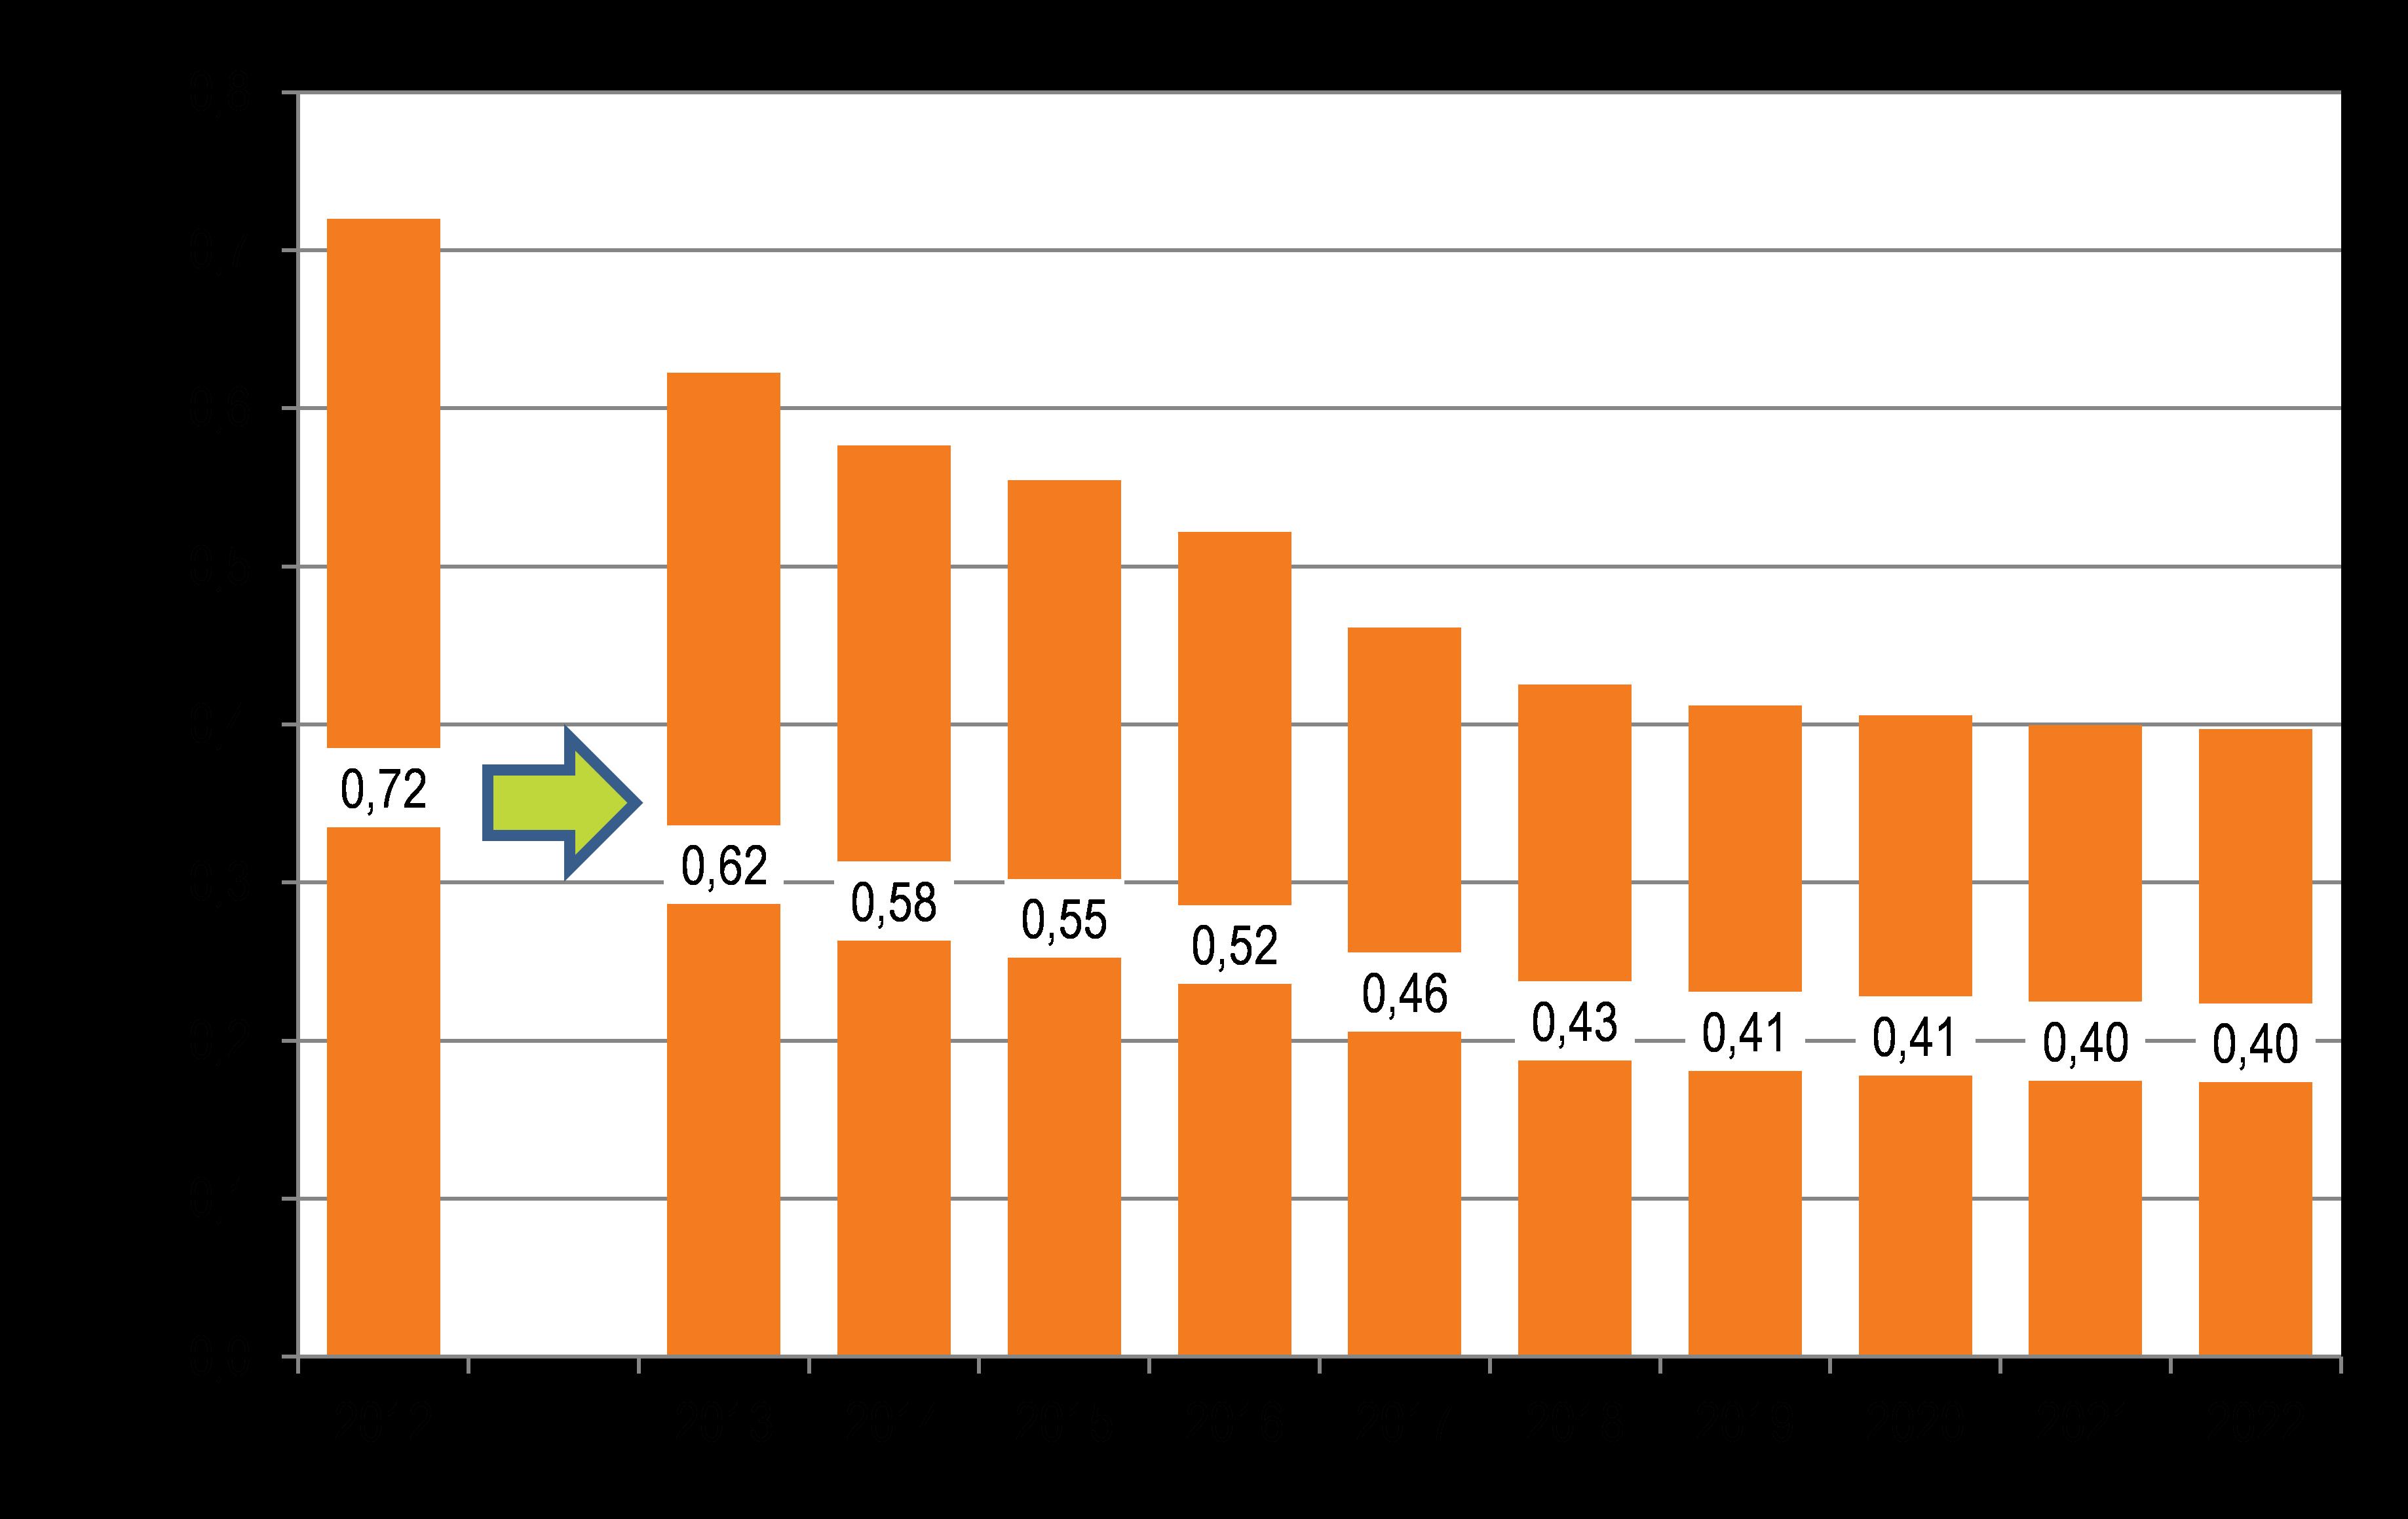 Strategia rozwoju Grupy ENERGA na lata 2013-2020